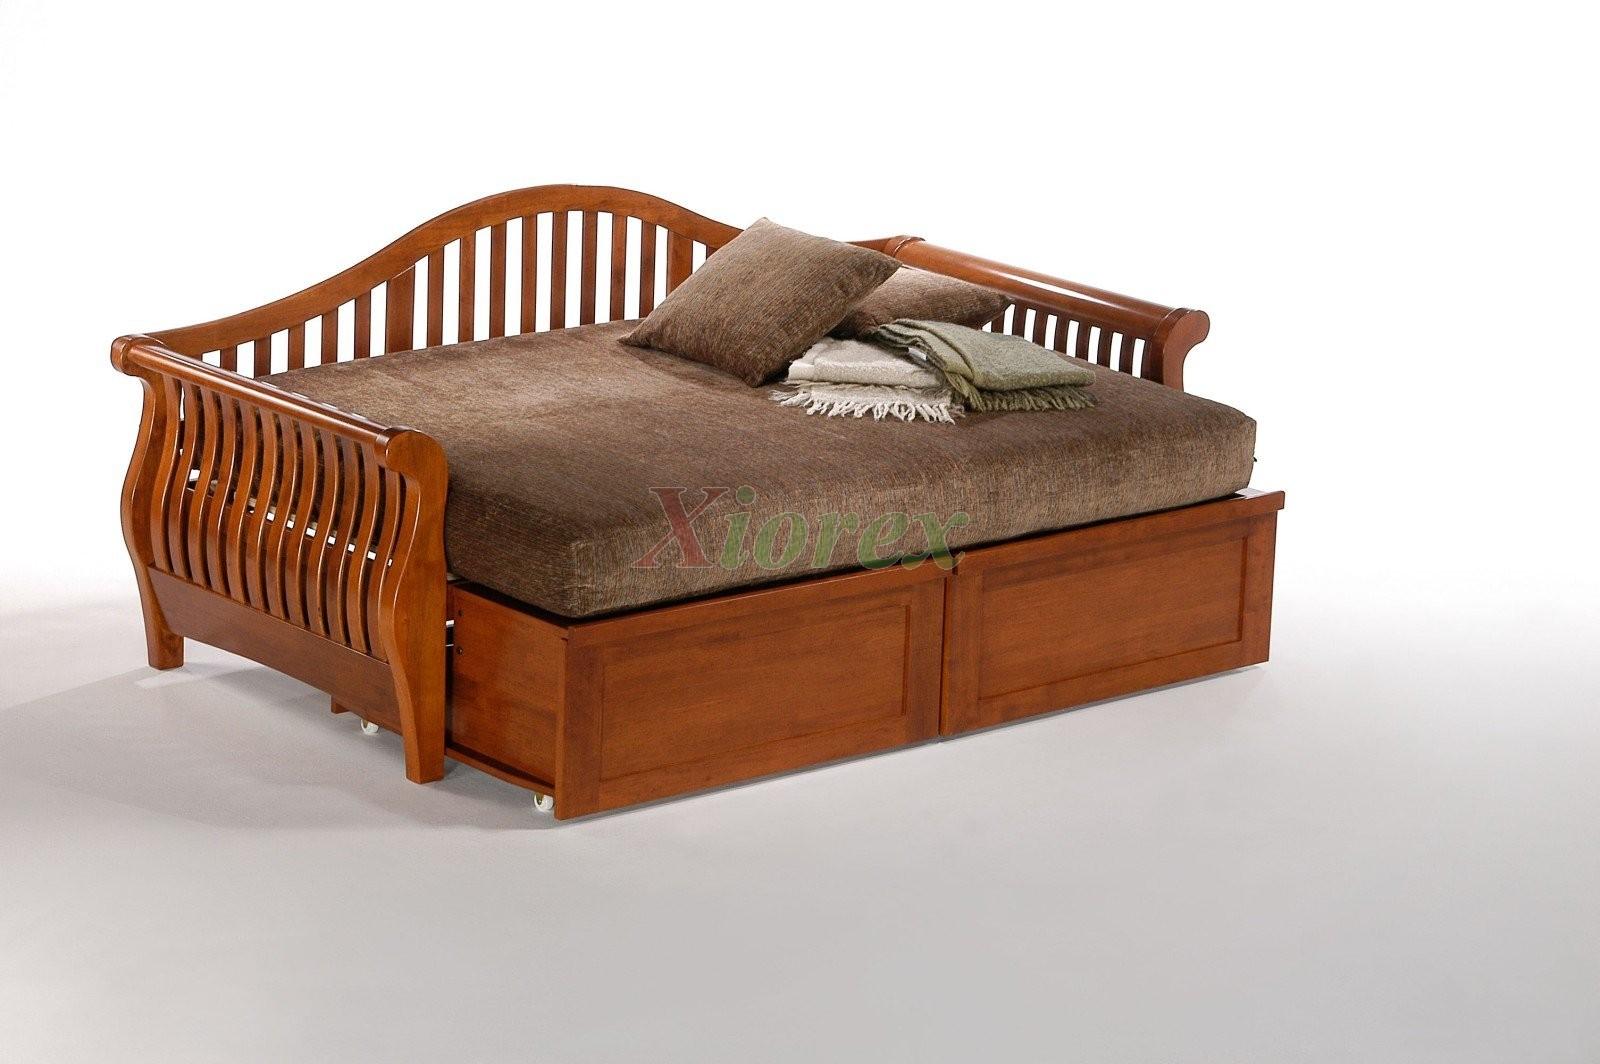 Ikea Bedroom Sets Furniture Store As Well Guarda Roupas Planejado Em L